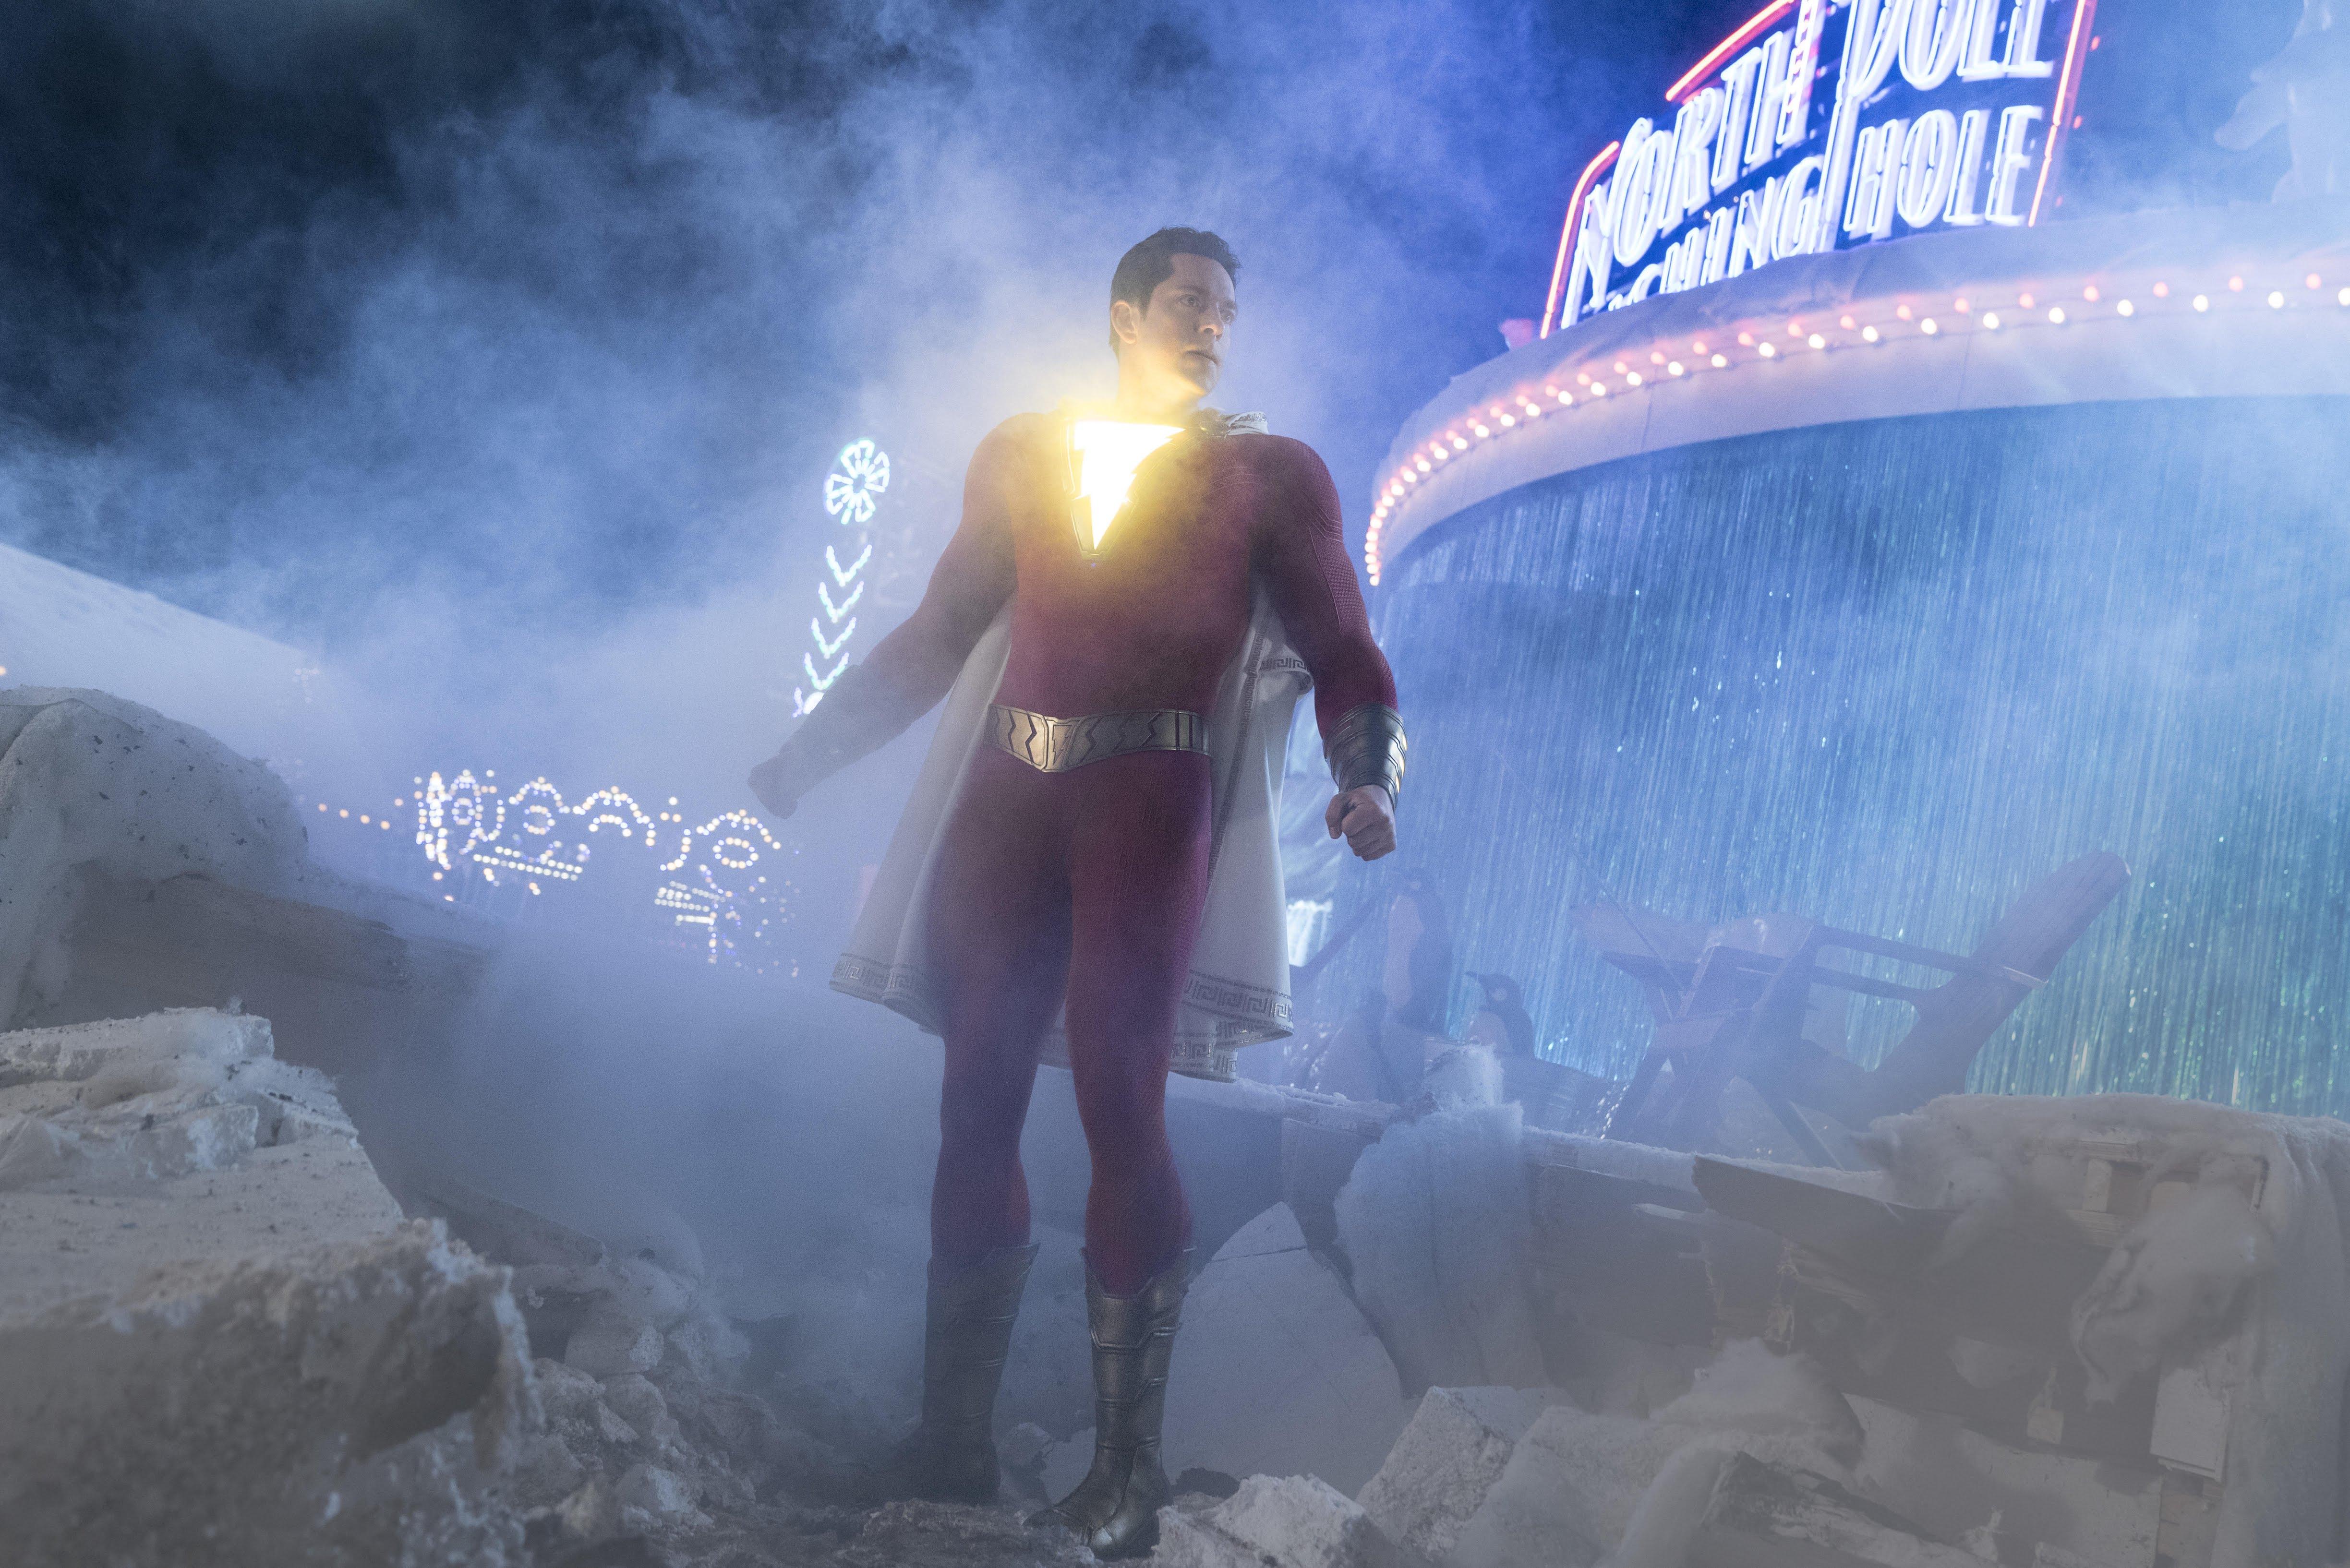 Shazam : DC コミックスのヒーロー映画「シャザム」が、悪役のドクター・シヴァナと対決する見せ場を盛り込んだ中華版の新しい予告編 ! !